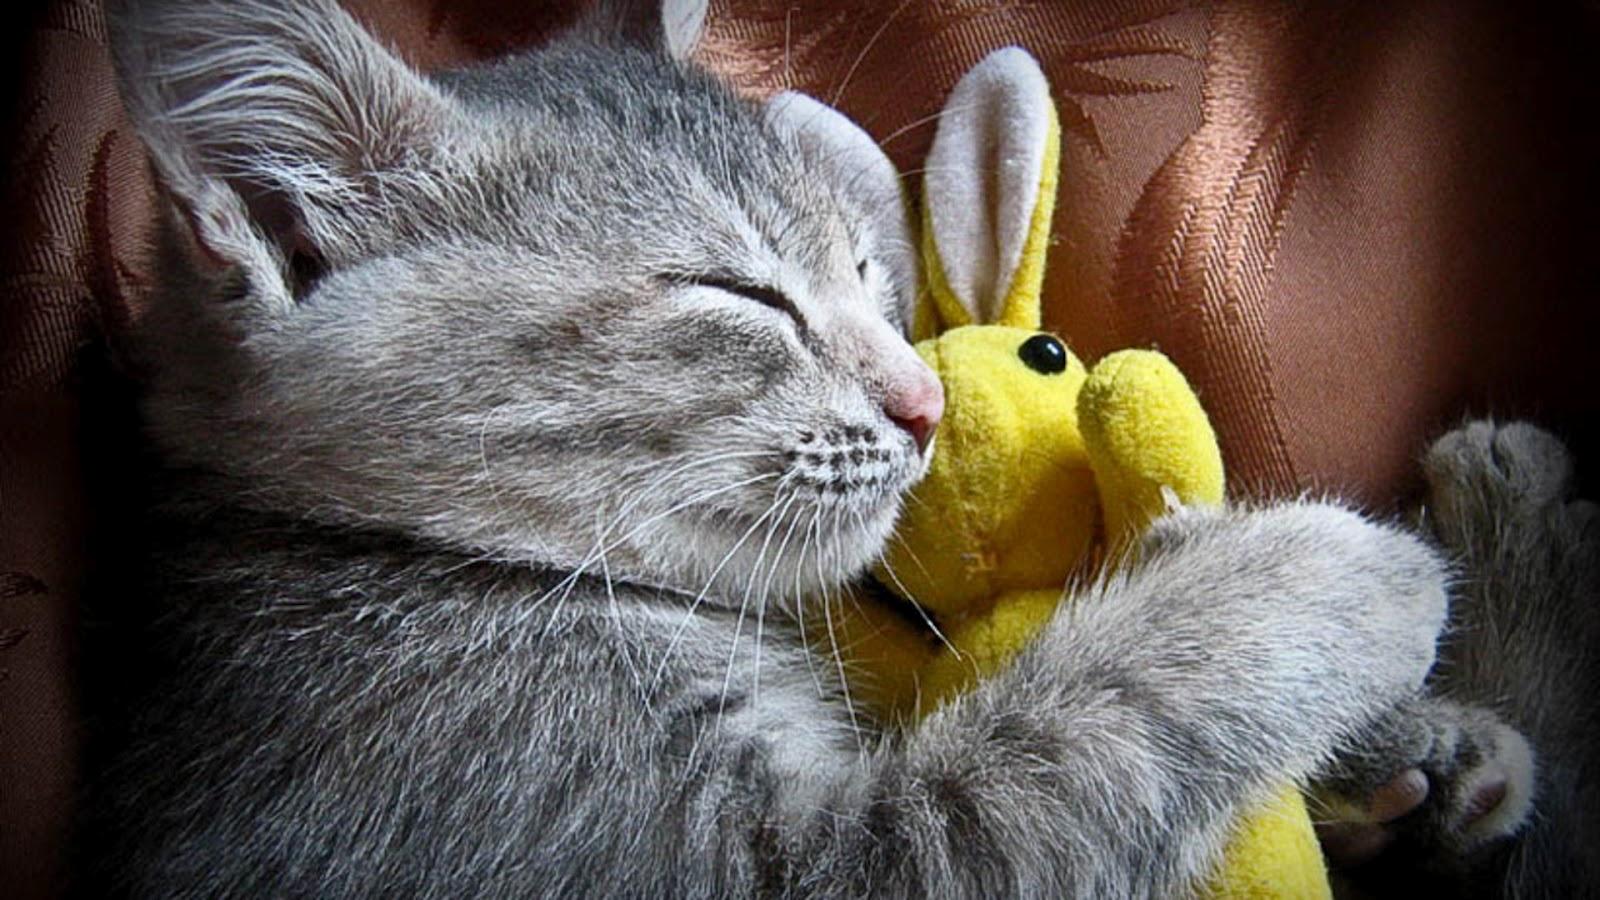 cute cats sleep wallpaper - photo #25